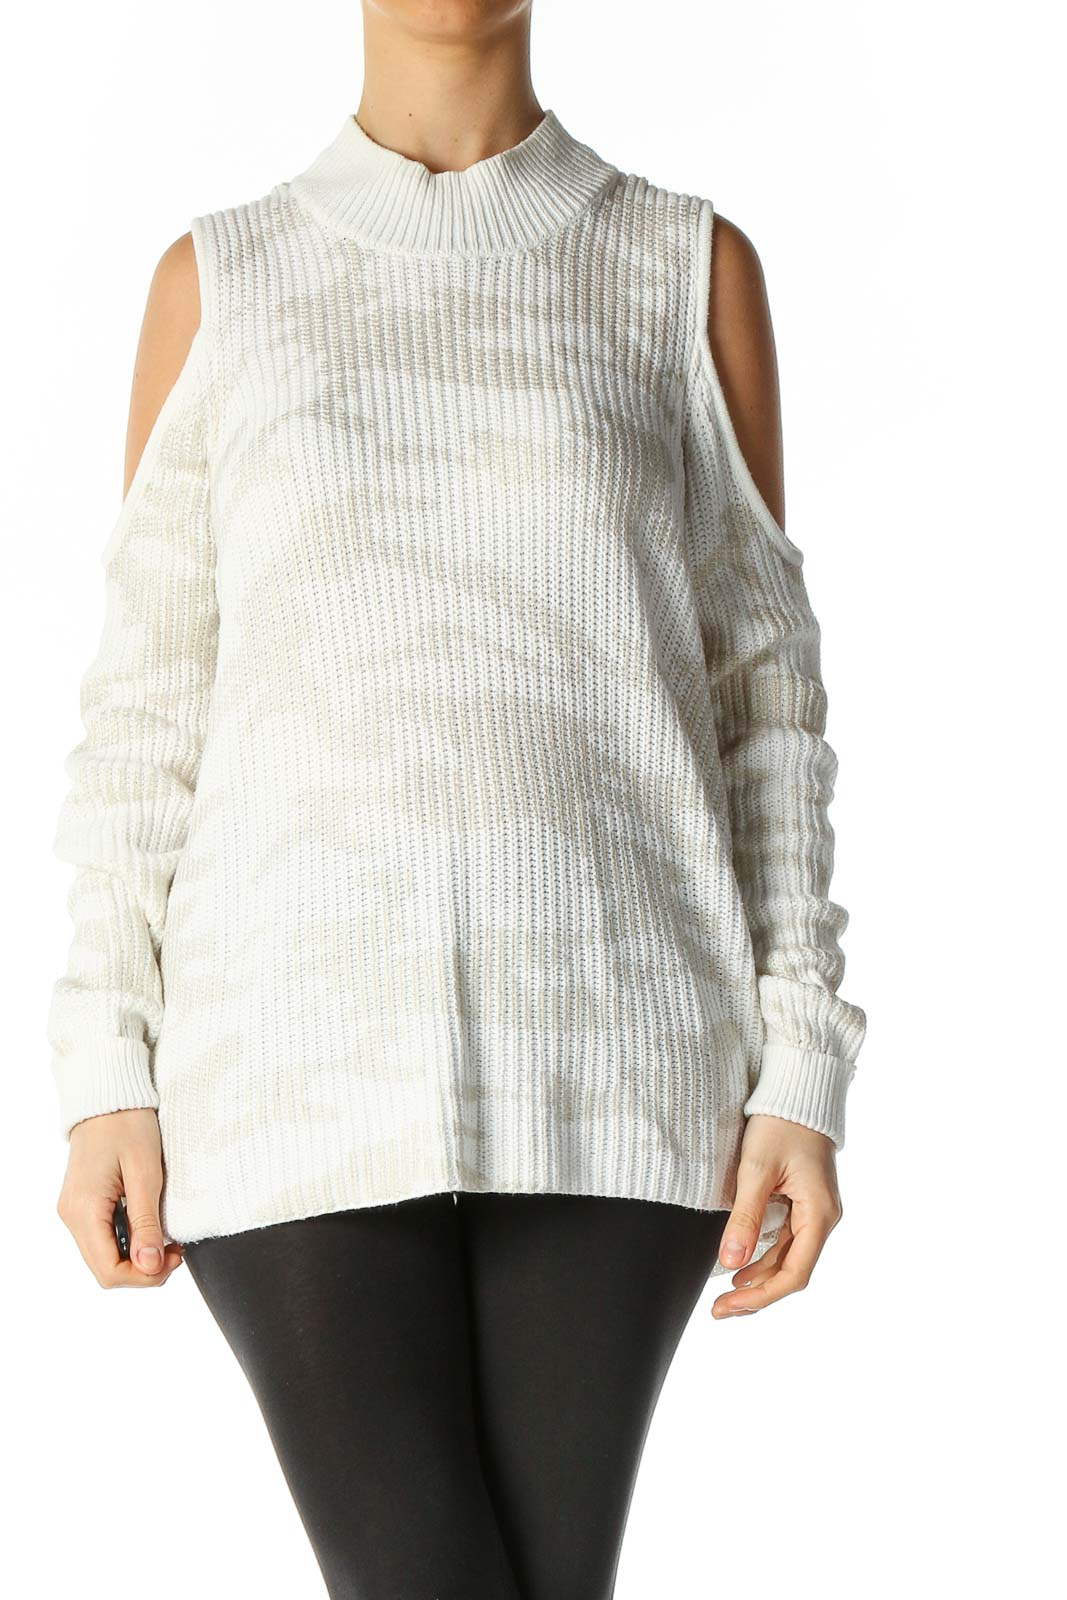 White Textured Semiformal Sweater Front